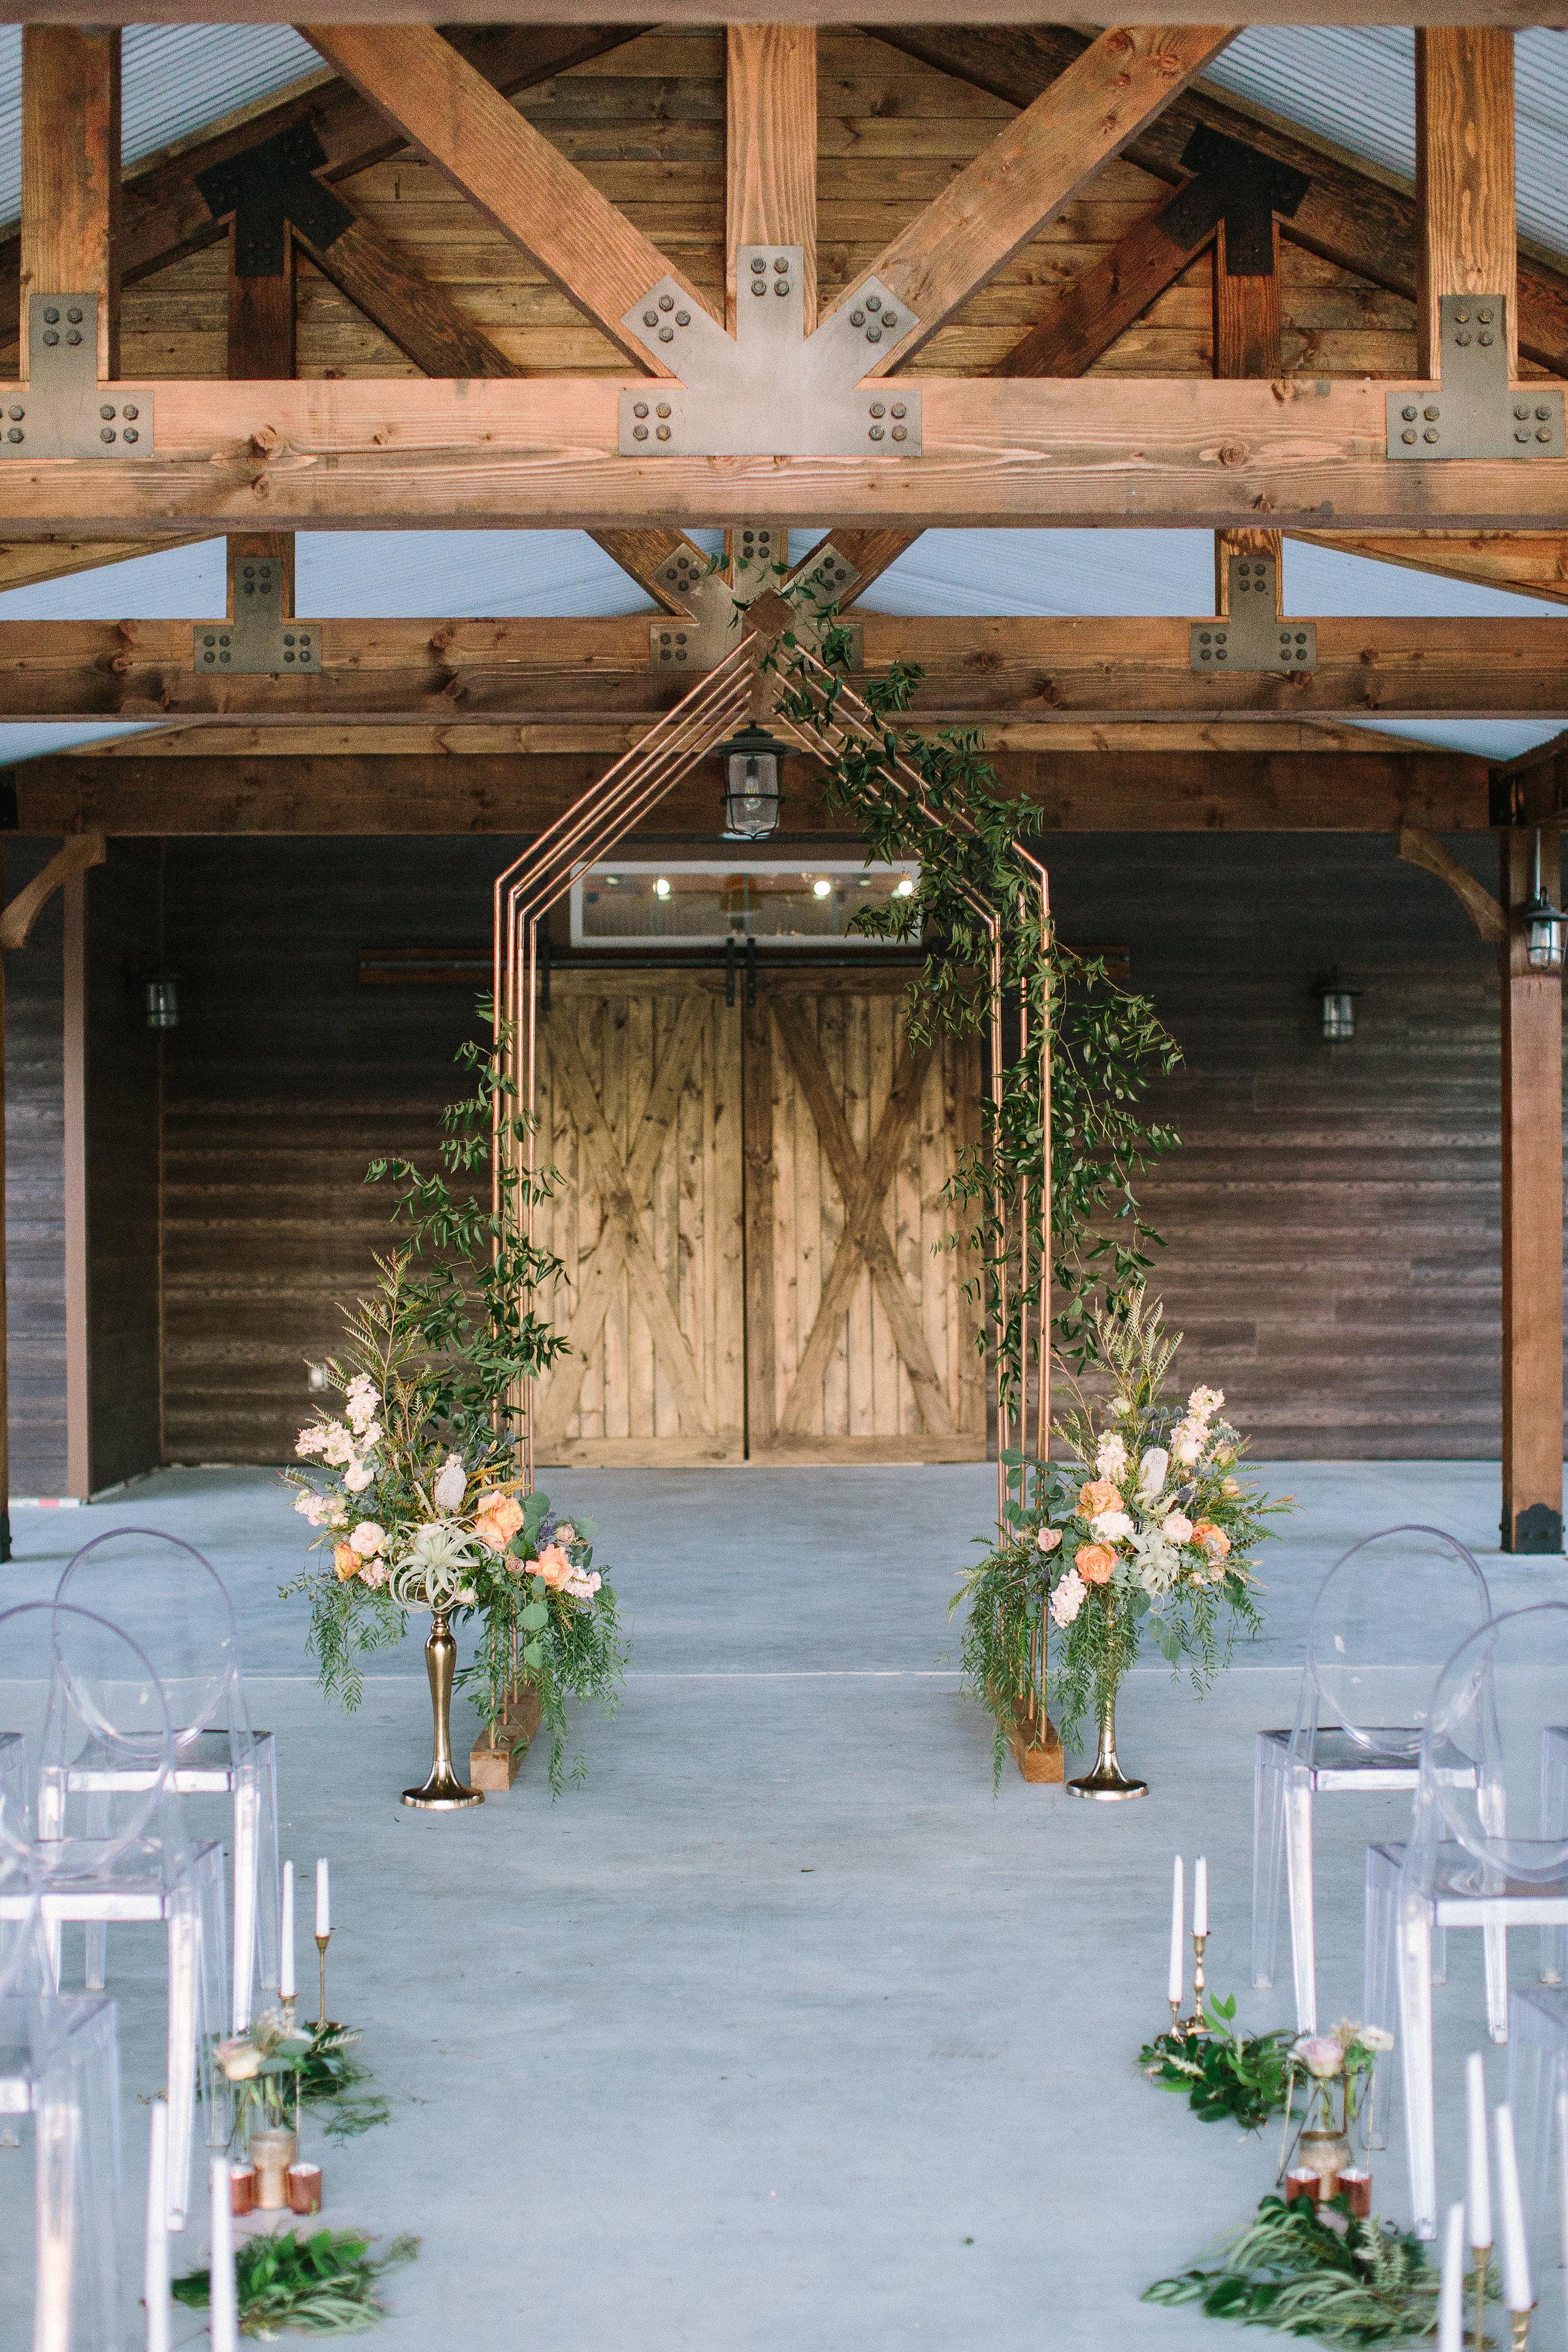 Ellen-Ashton-Photography-Peach-Creek-Ranch-Weddings-Wed-and-Prosper368